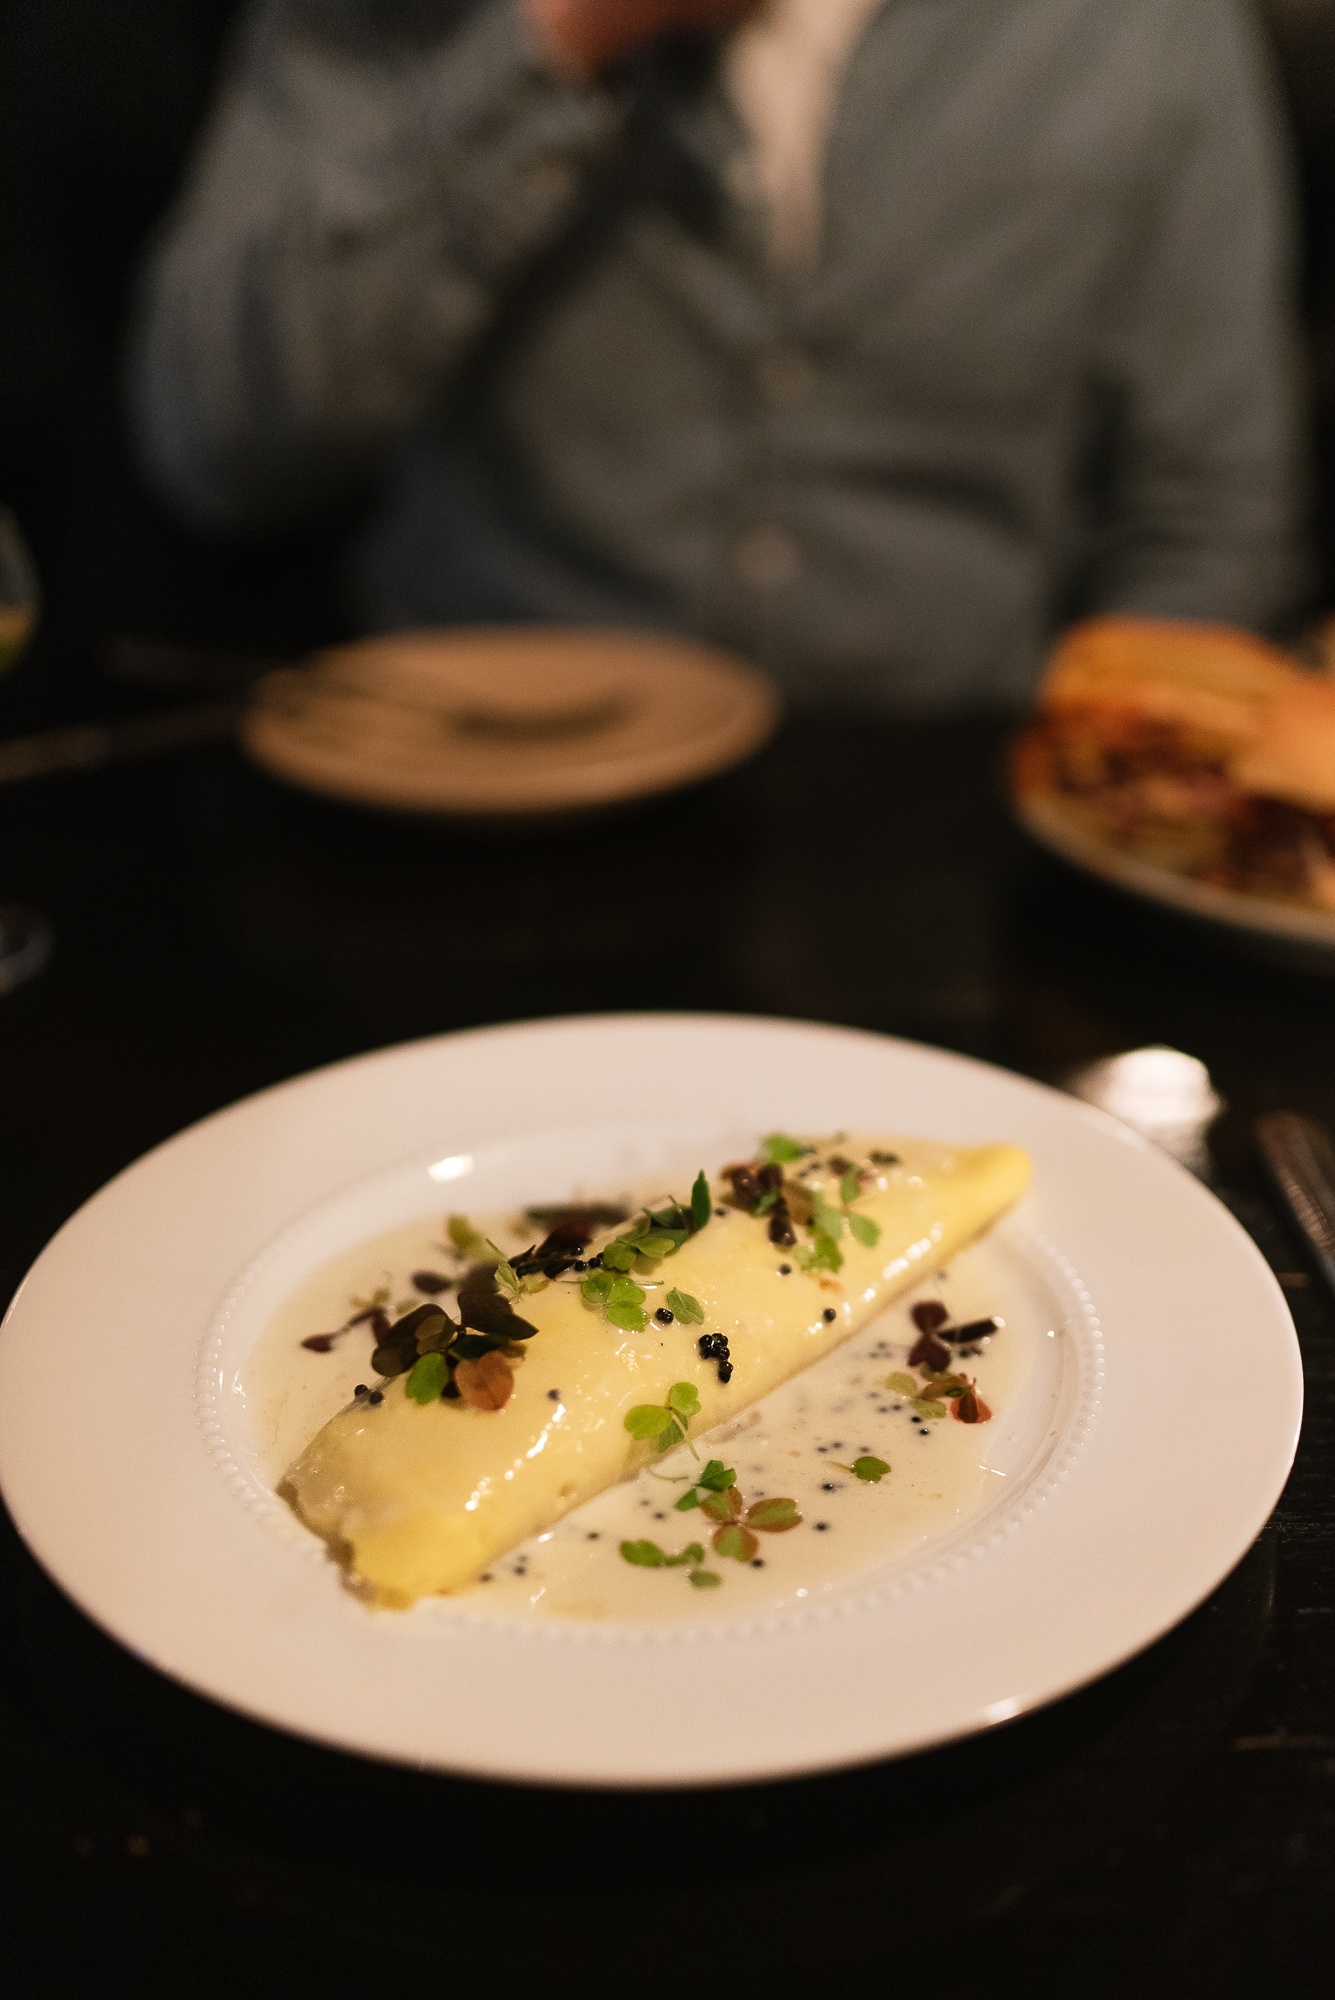 omelette - camembert, koji beurre blanc, caviar